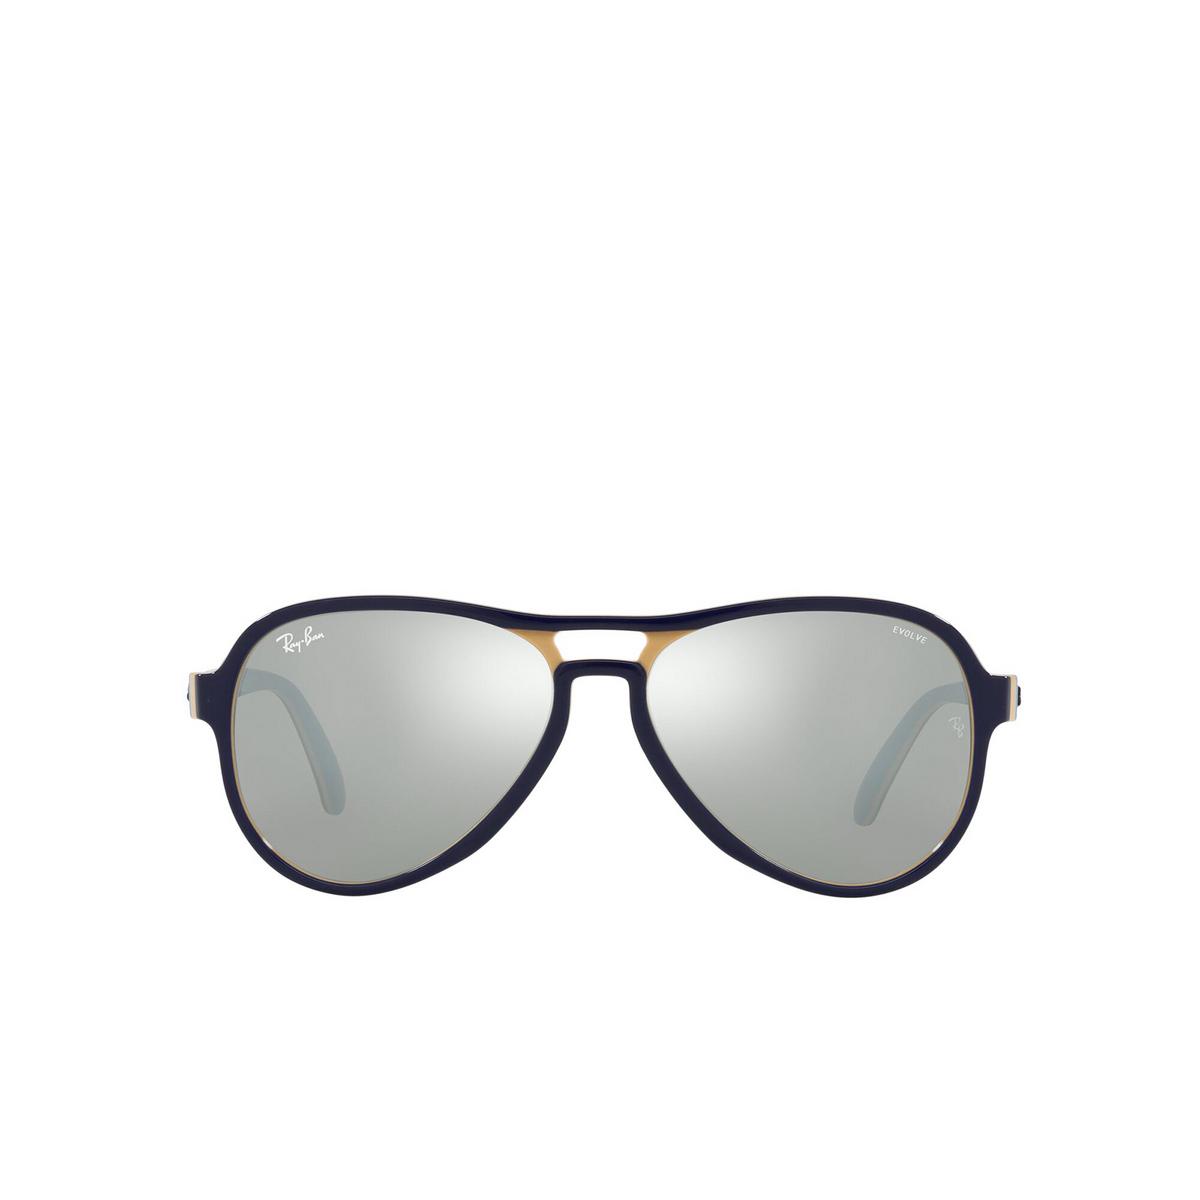 Ray-Ban® Aviator Sunglasses: Vagabond RB4355 color Blue Creamy Light Blue 6546W3 - front view.